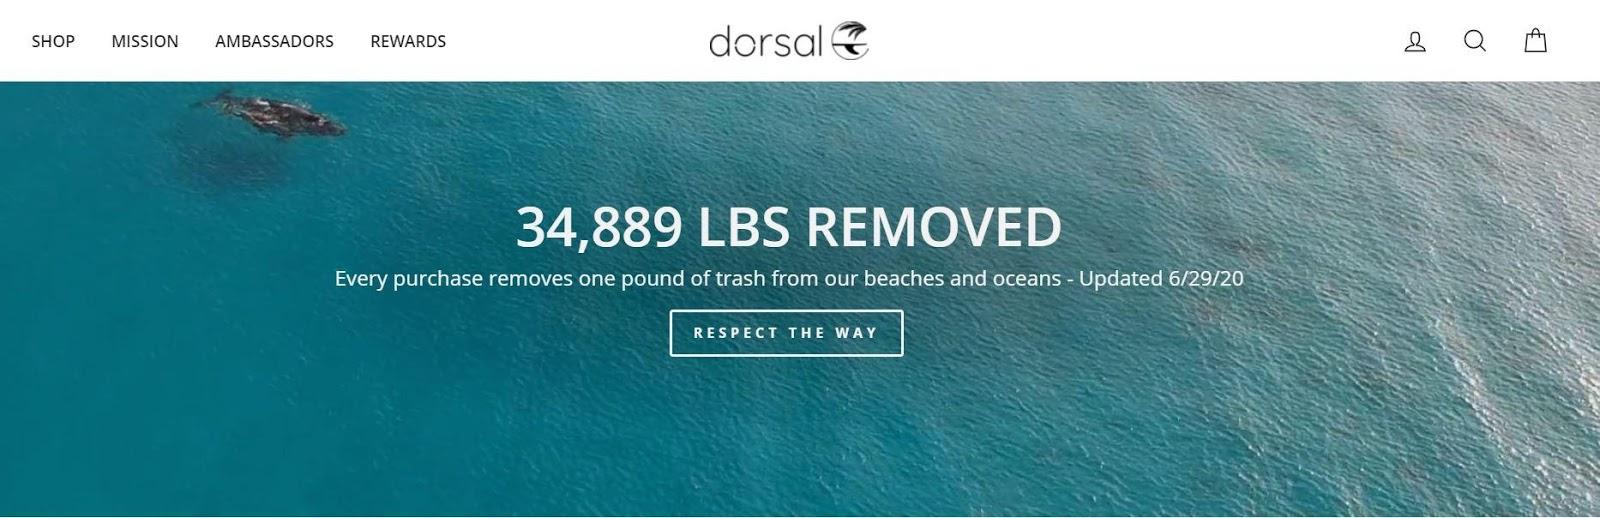 Dorsal landing page